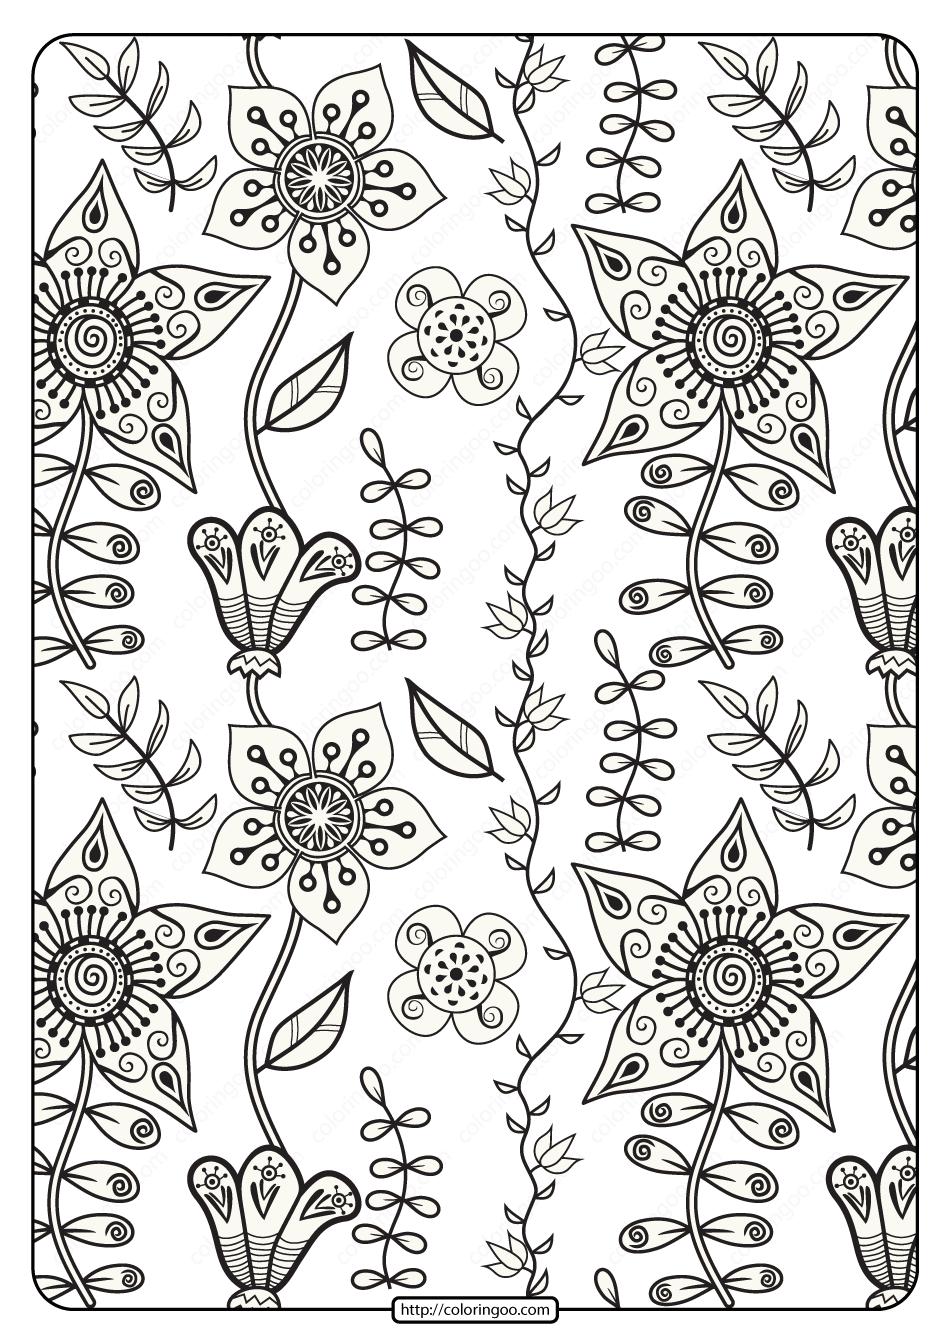 Free Printable Floral Pattern Pdf Coloring Page